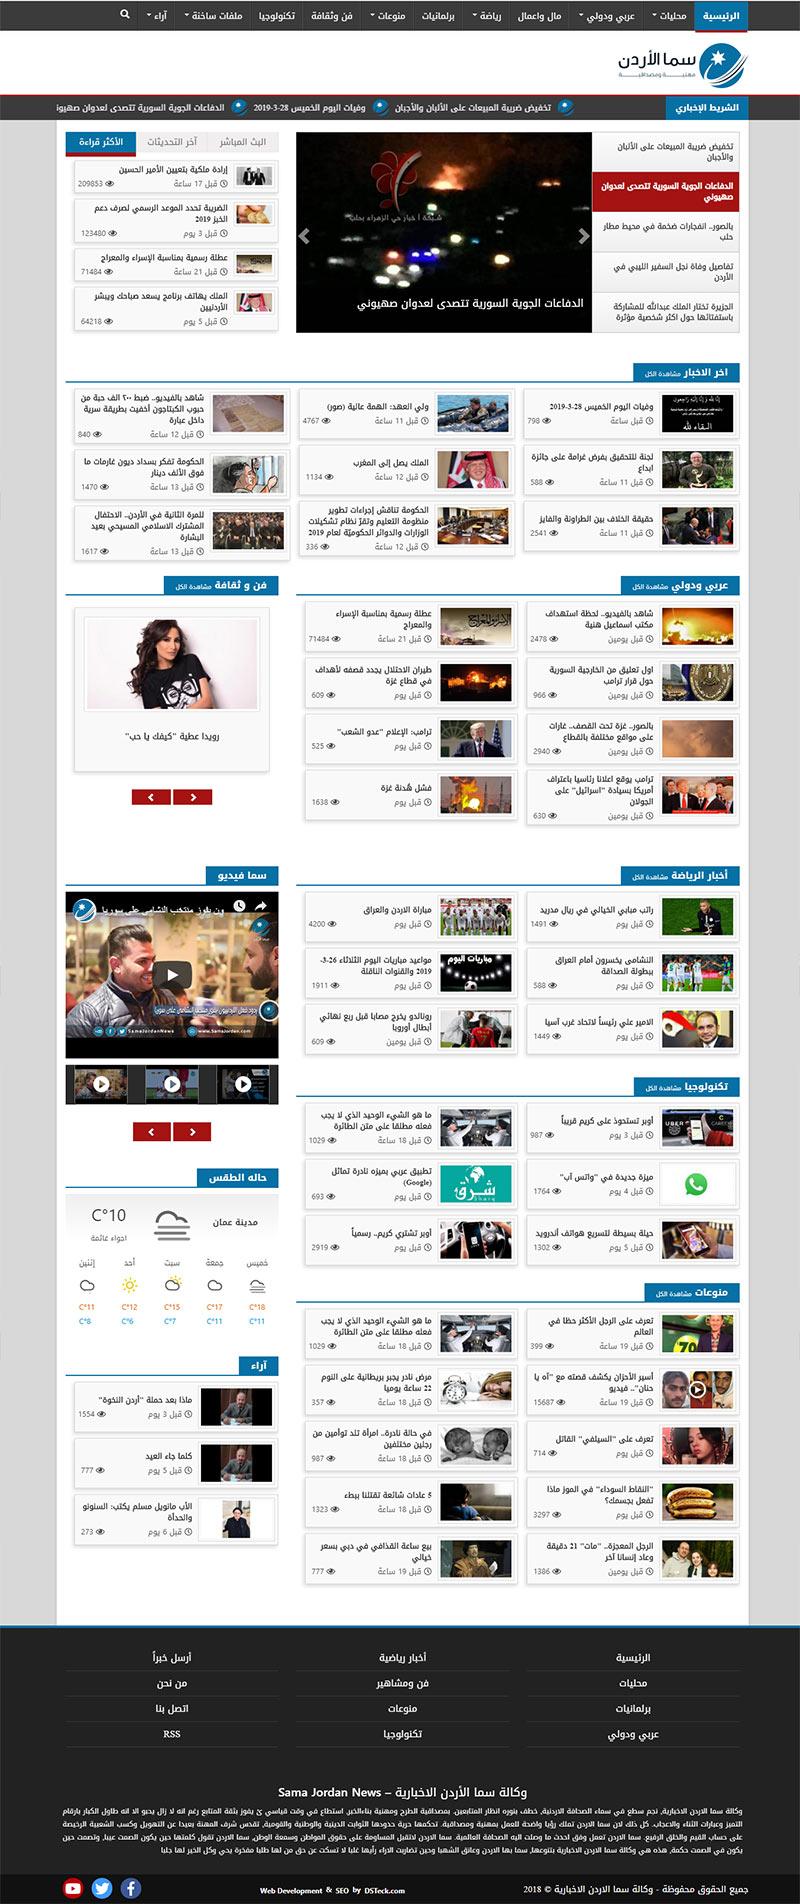 Sama Jordan News – Jordan